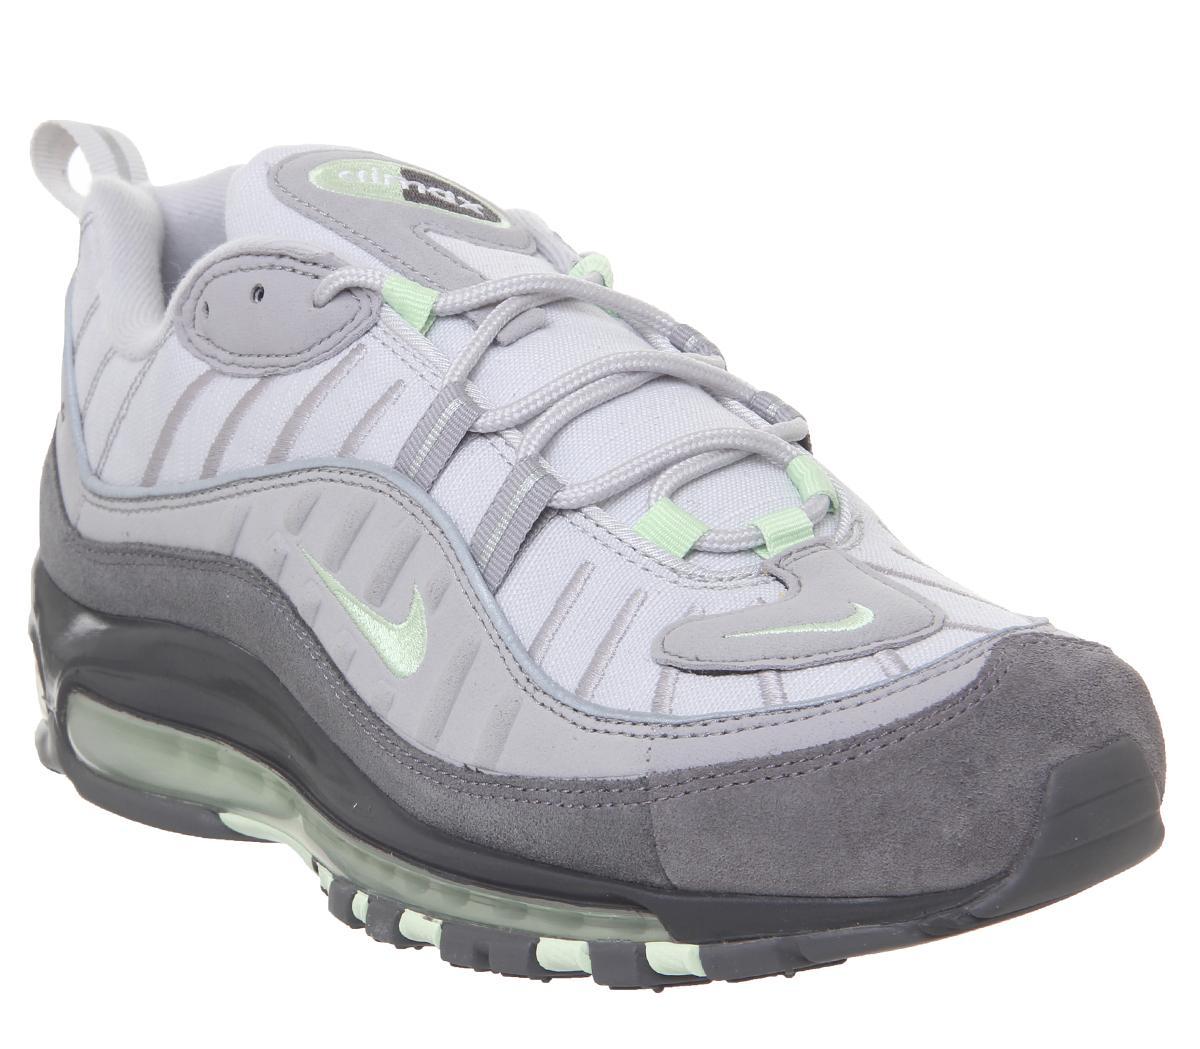 Nike Air Max 98 Trainers Vast Grey